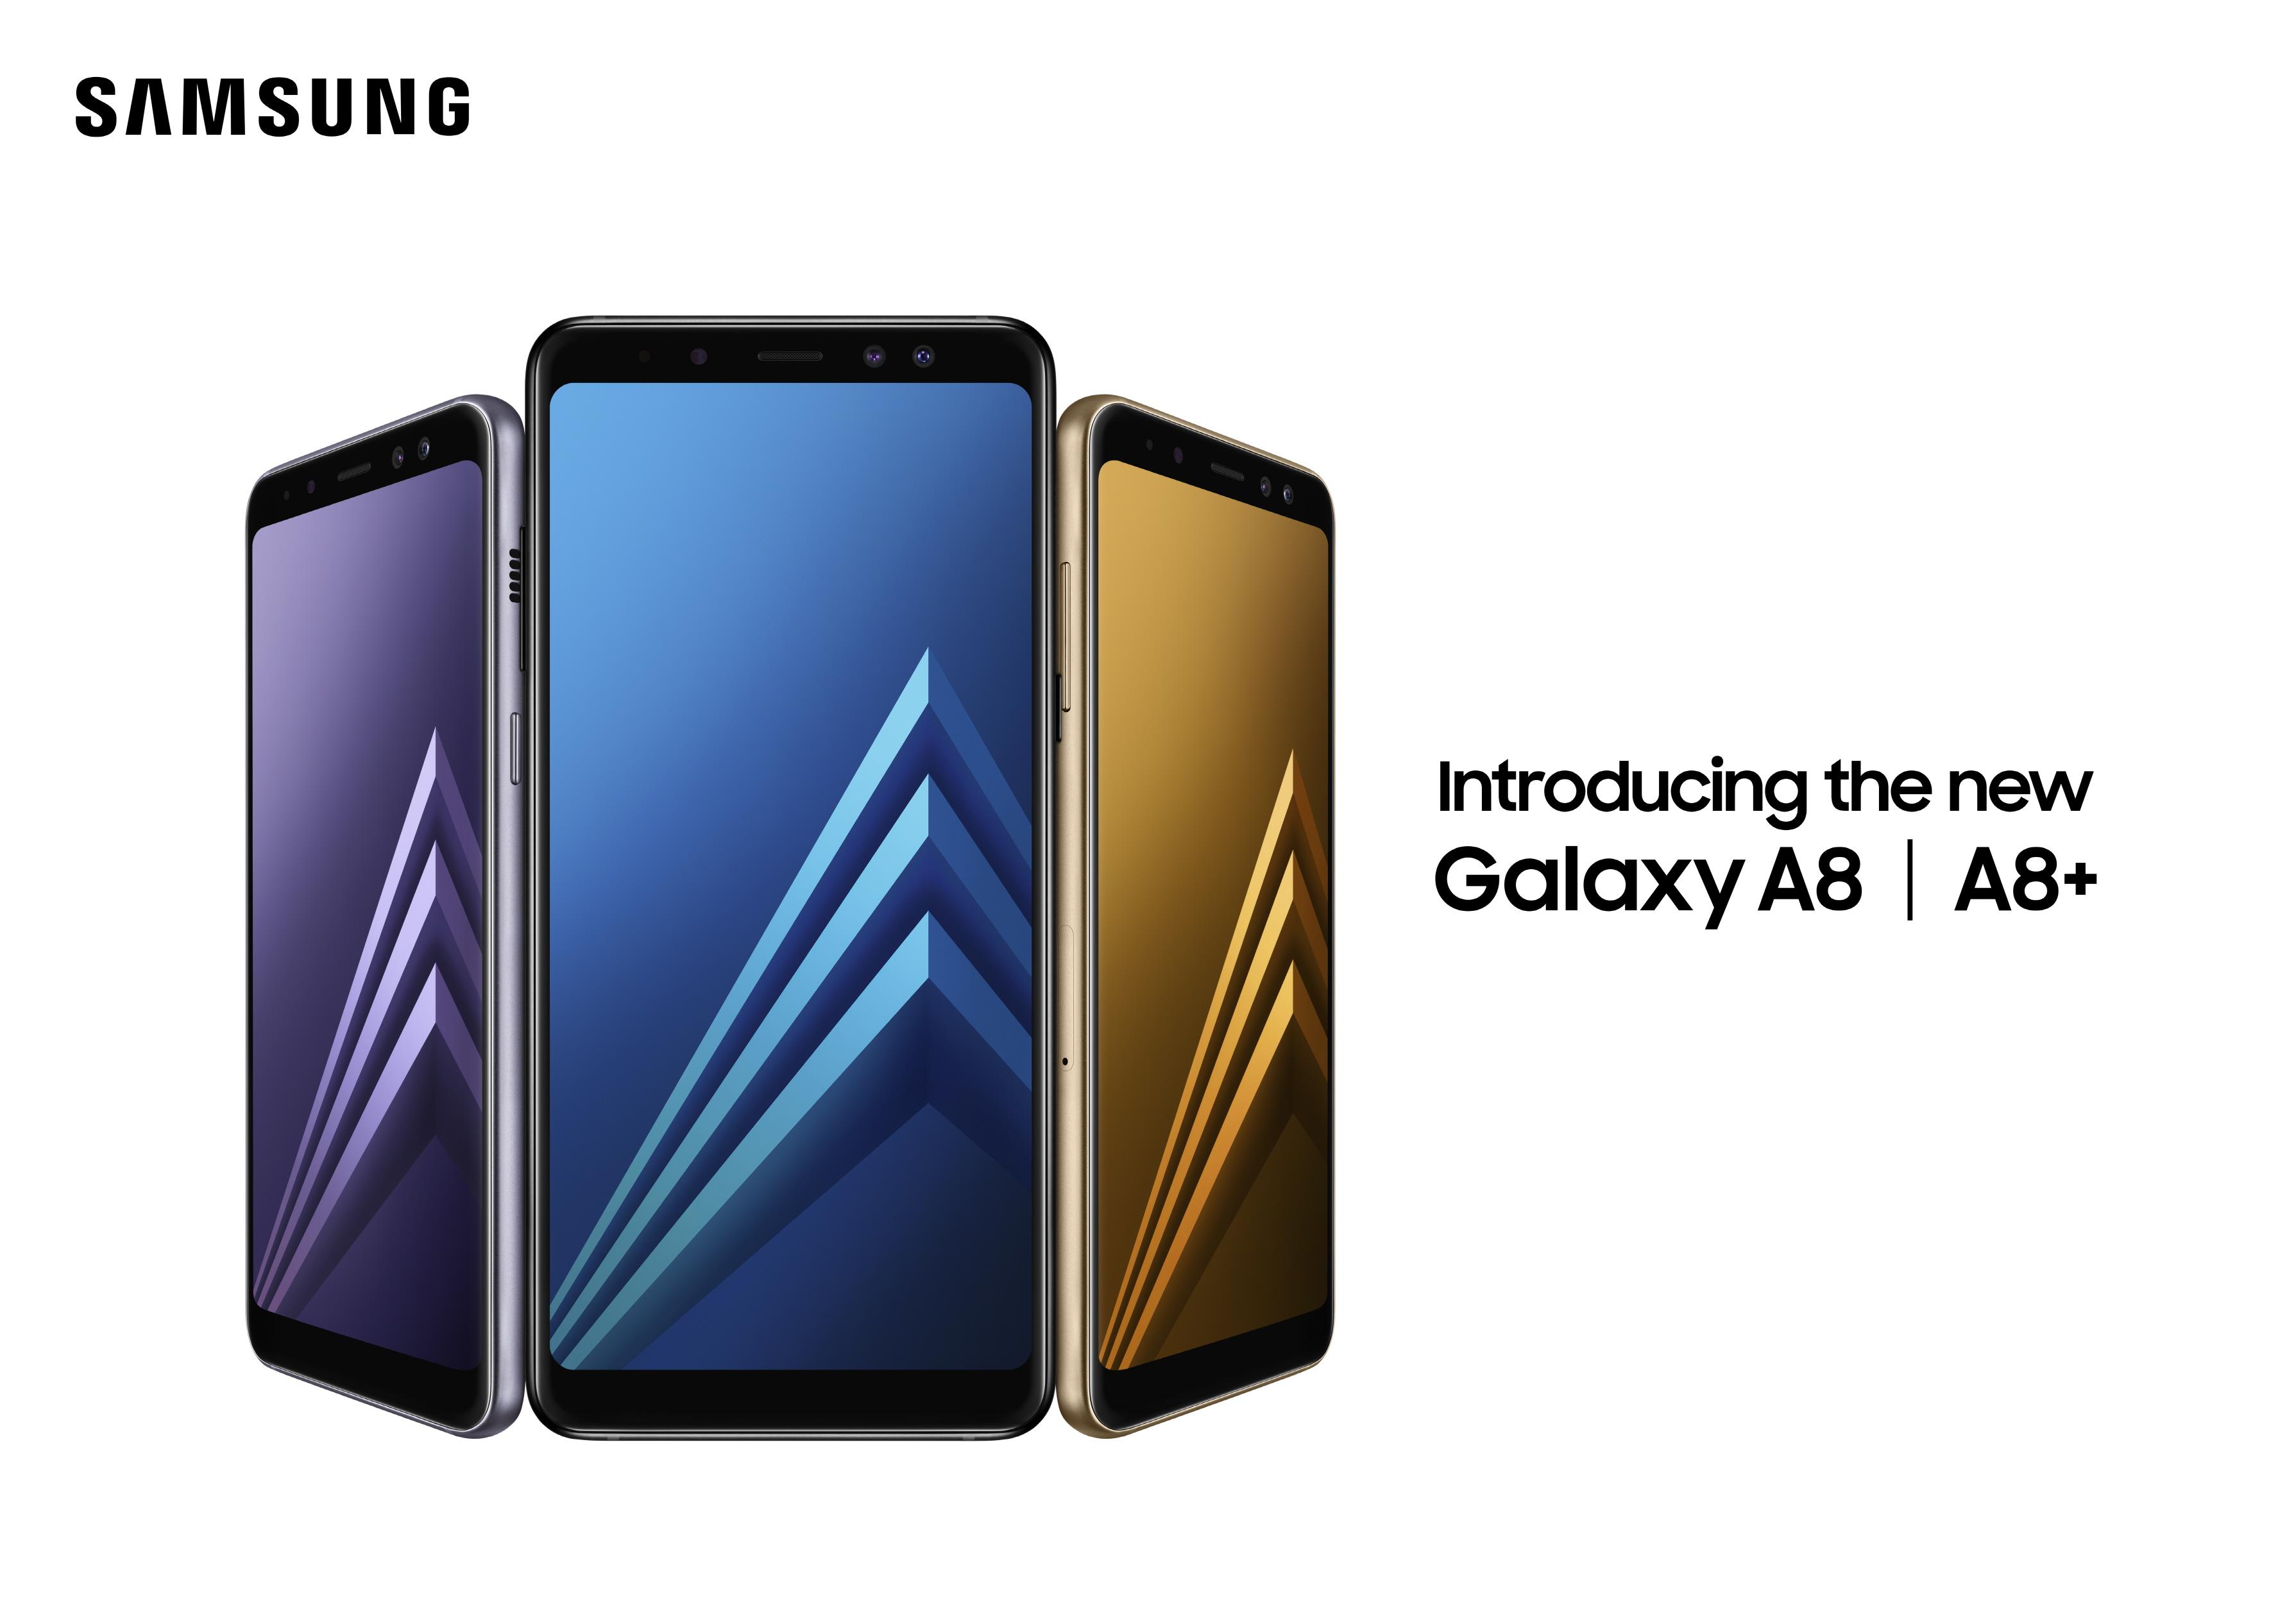 66dc318b091 Samsung announces dual-camera wielding midrange Galaxy A8 (2018) and ...